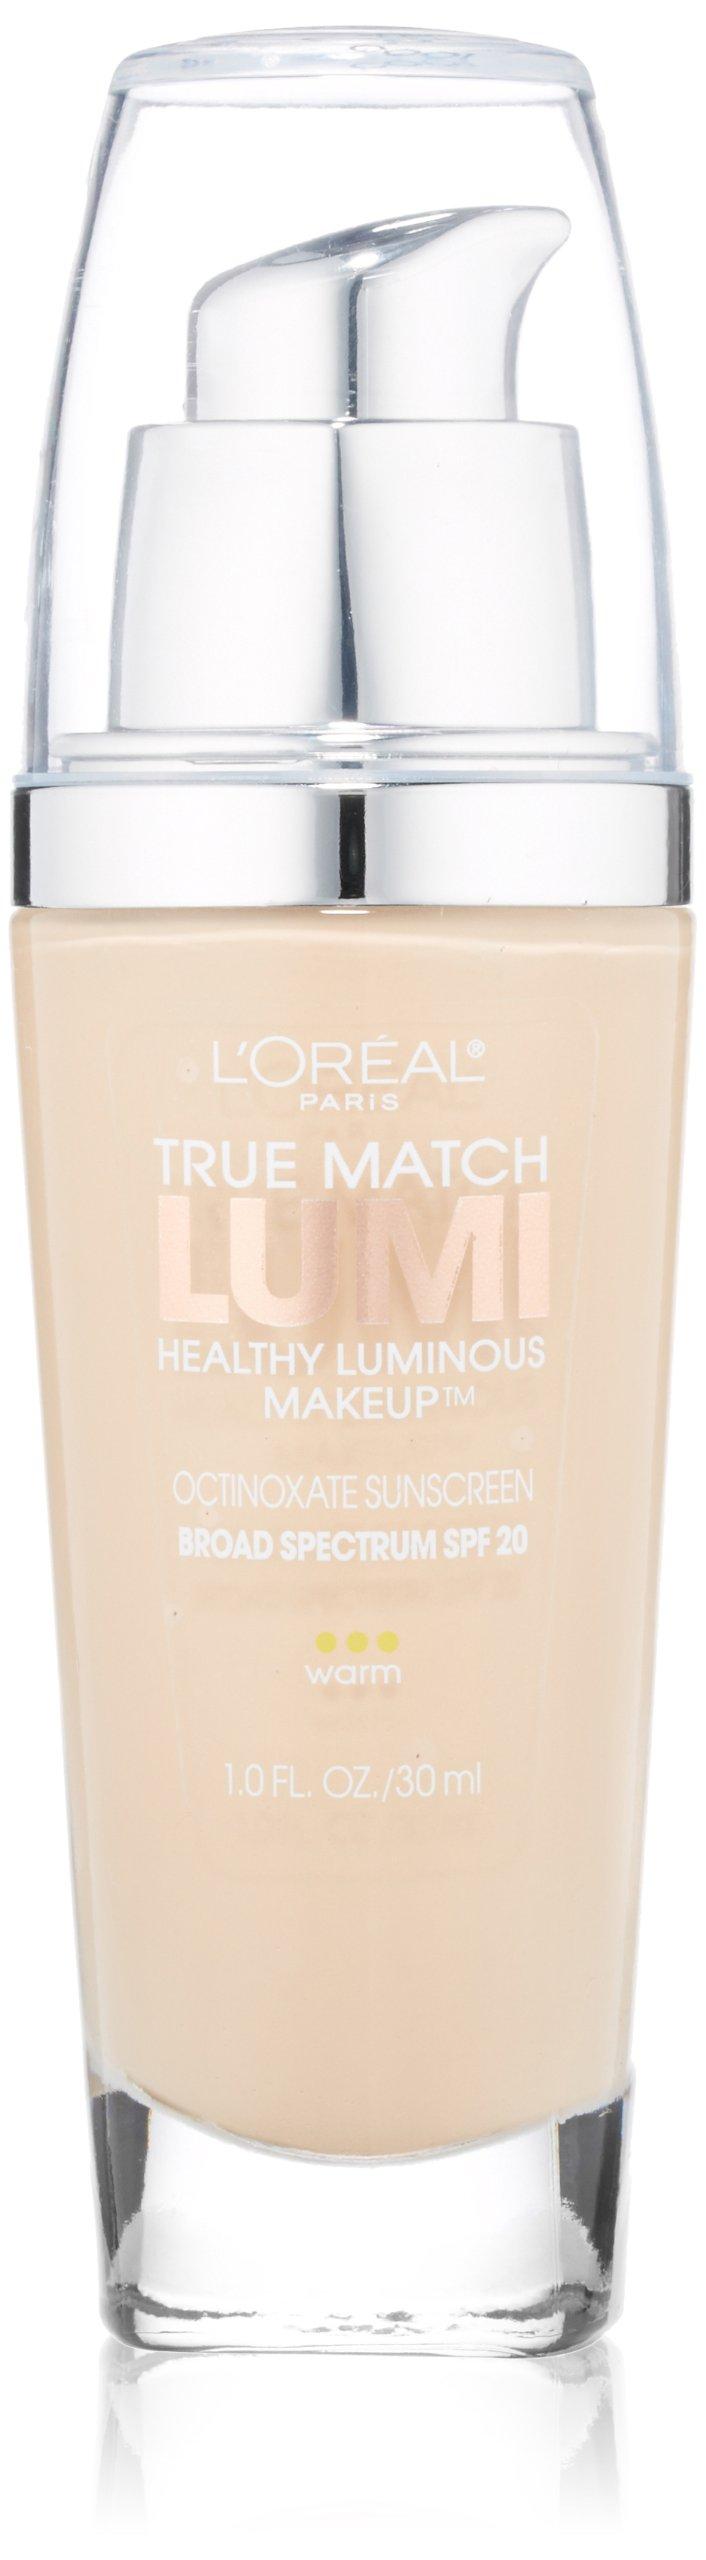 L'Oreal Paris True Match Lumi Healthy Luminous Makeup, W1-2 Porcelain/Light Ivory, 1 fl; oz.